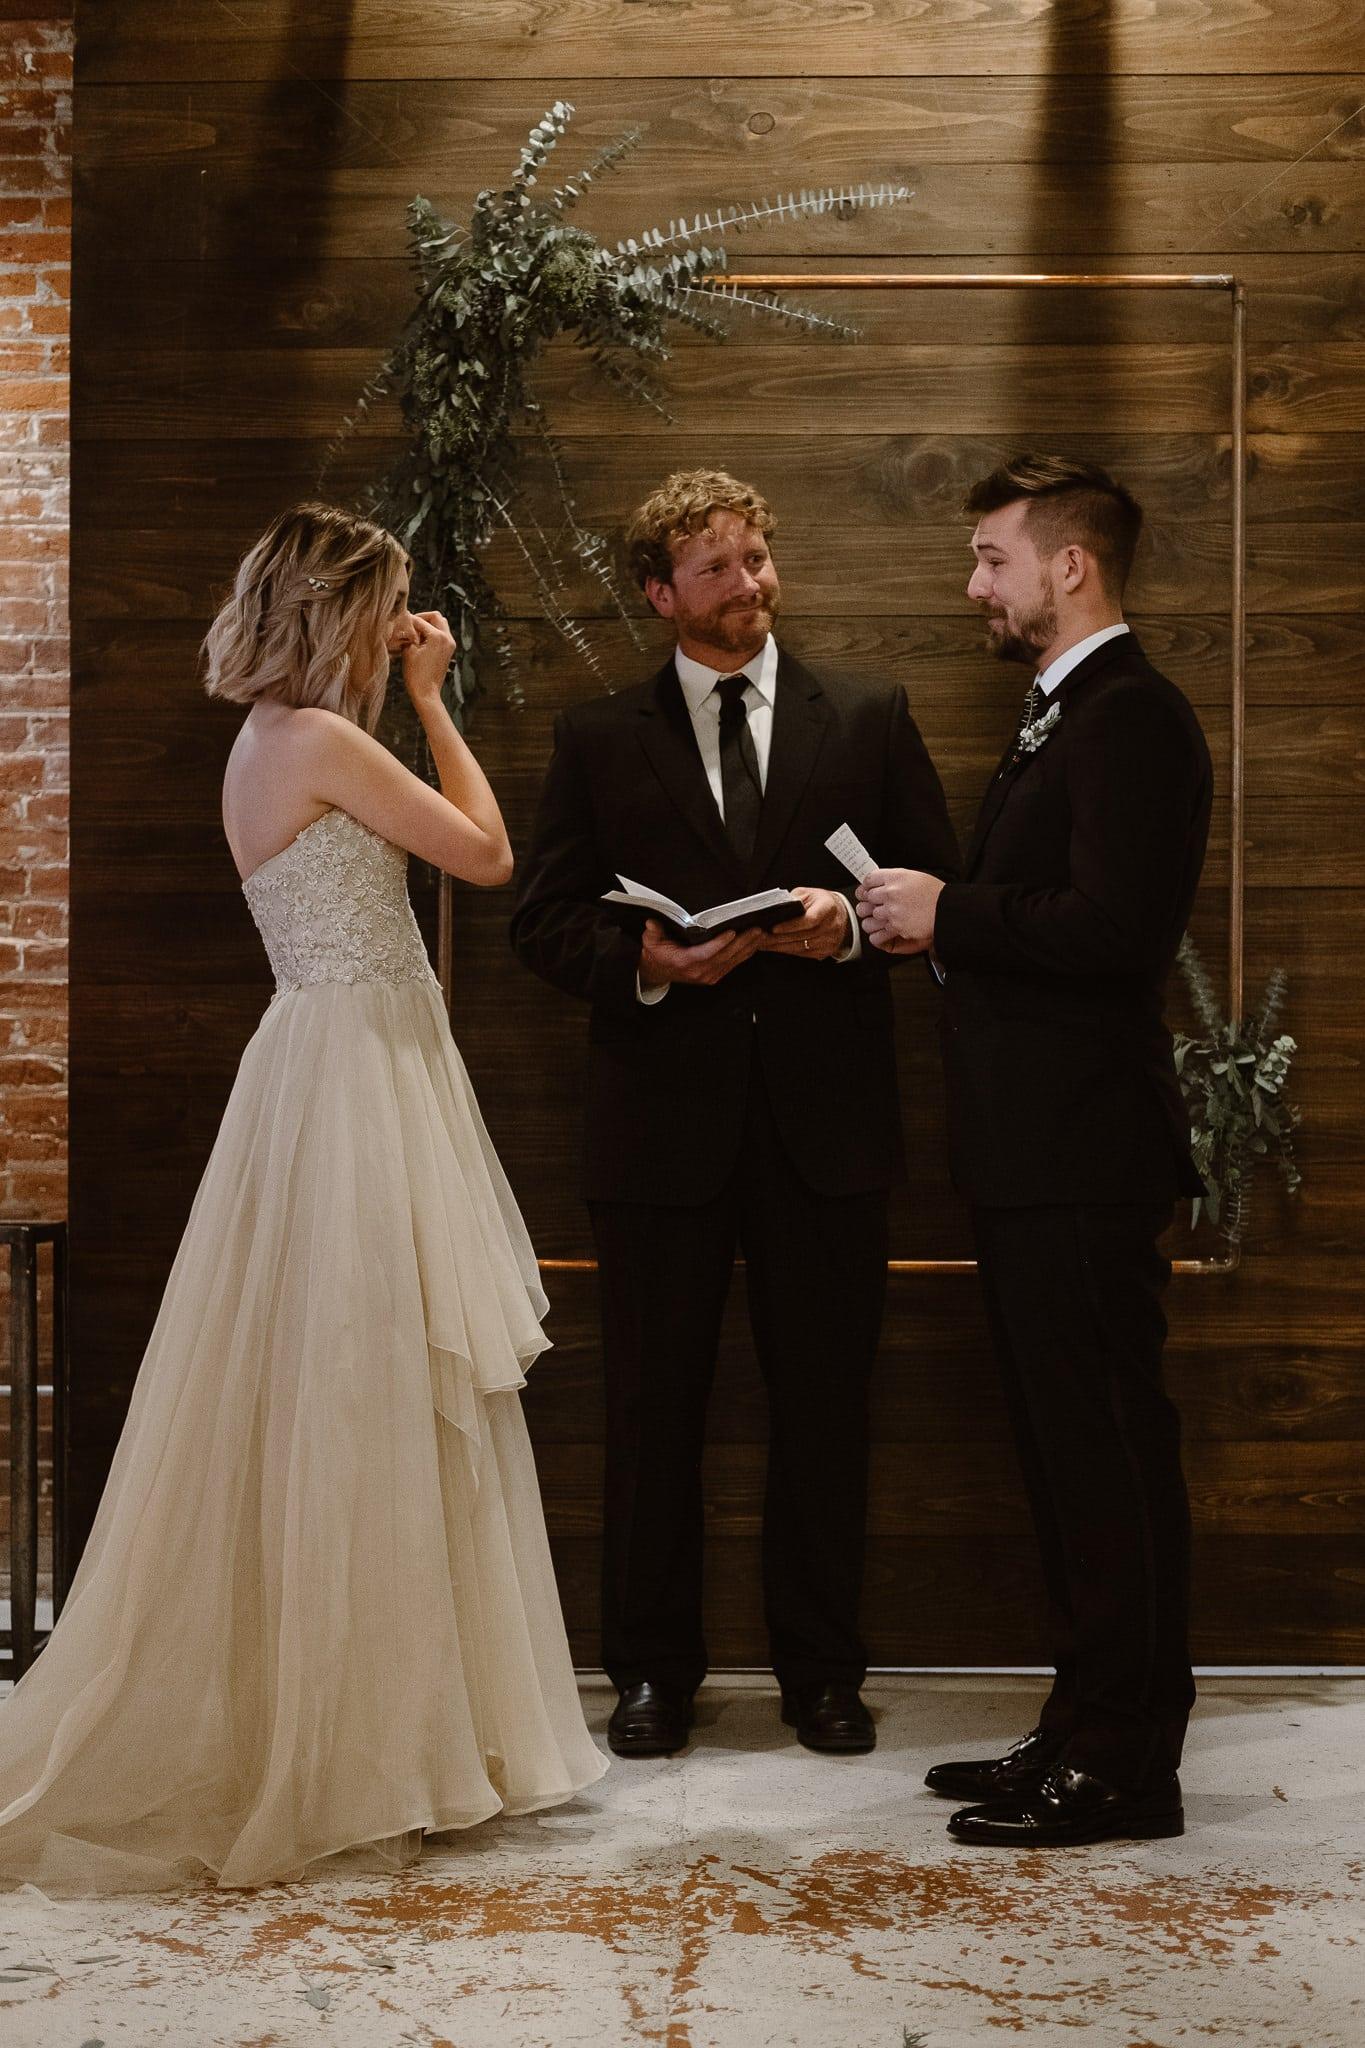 St Vrain Wedding Photographer | Longmont Wedding Photographer | Colorado Winter Wedding Photographer, Colorado industrial chic wedding ceremony,